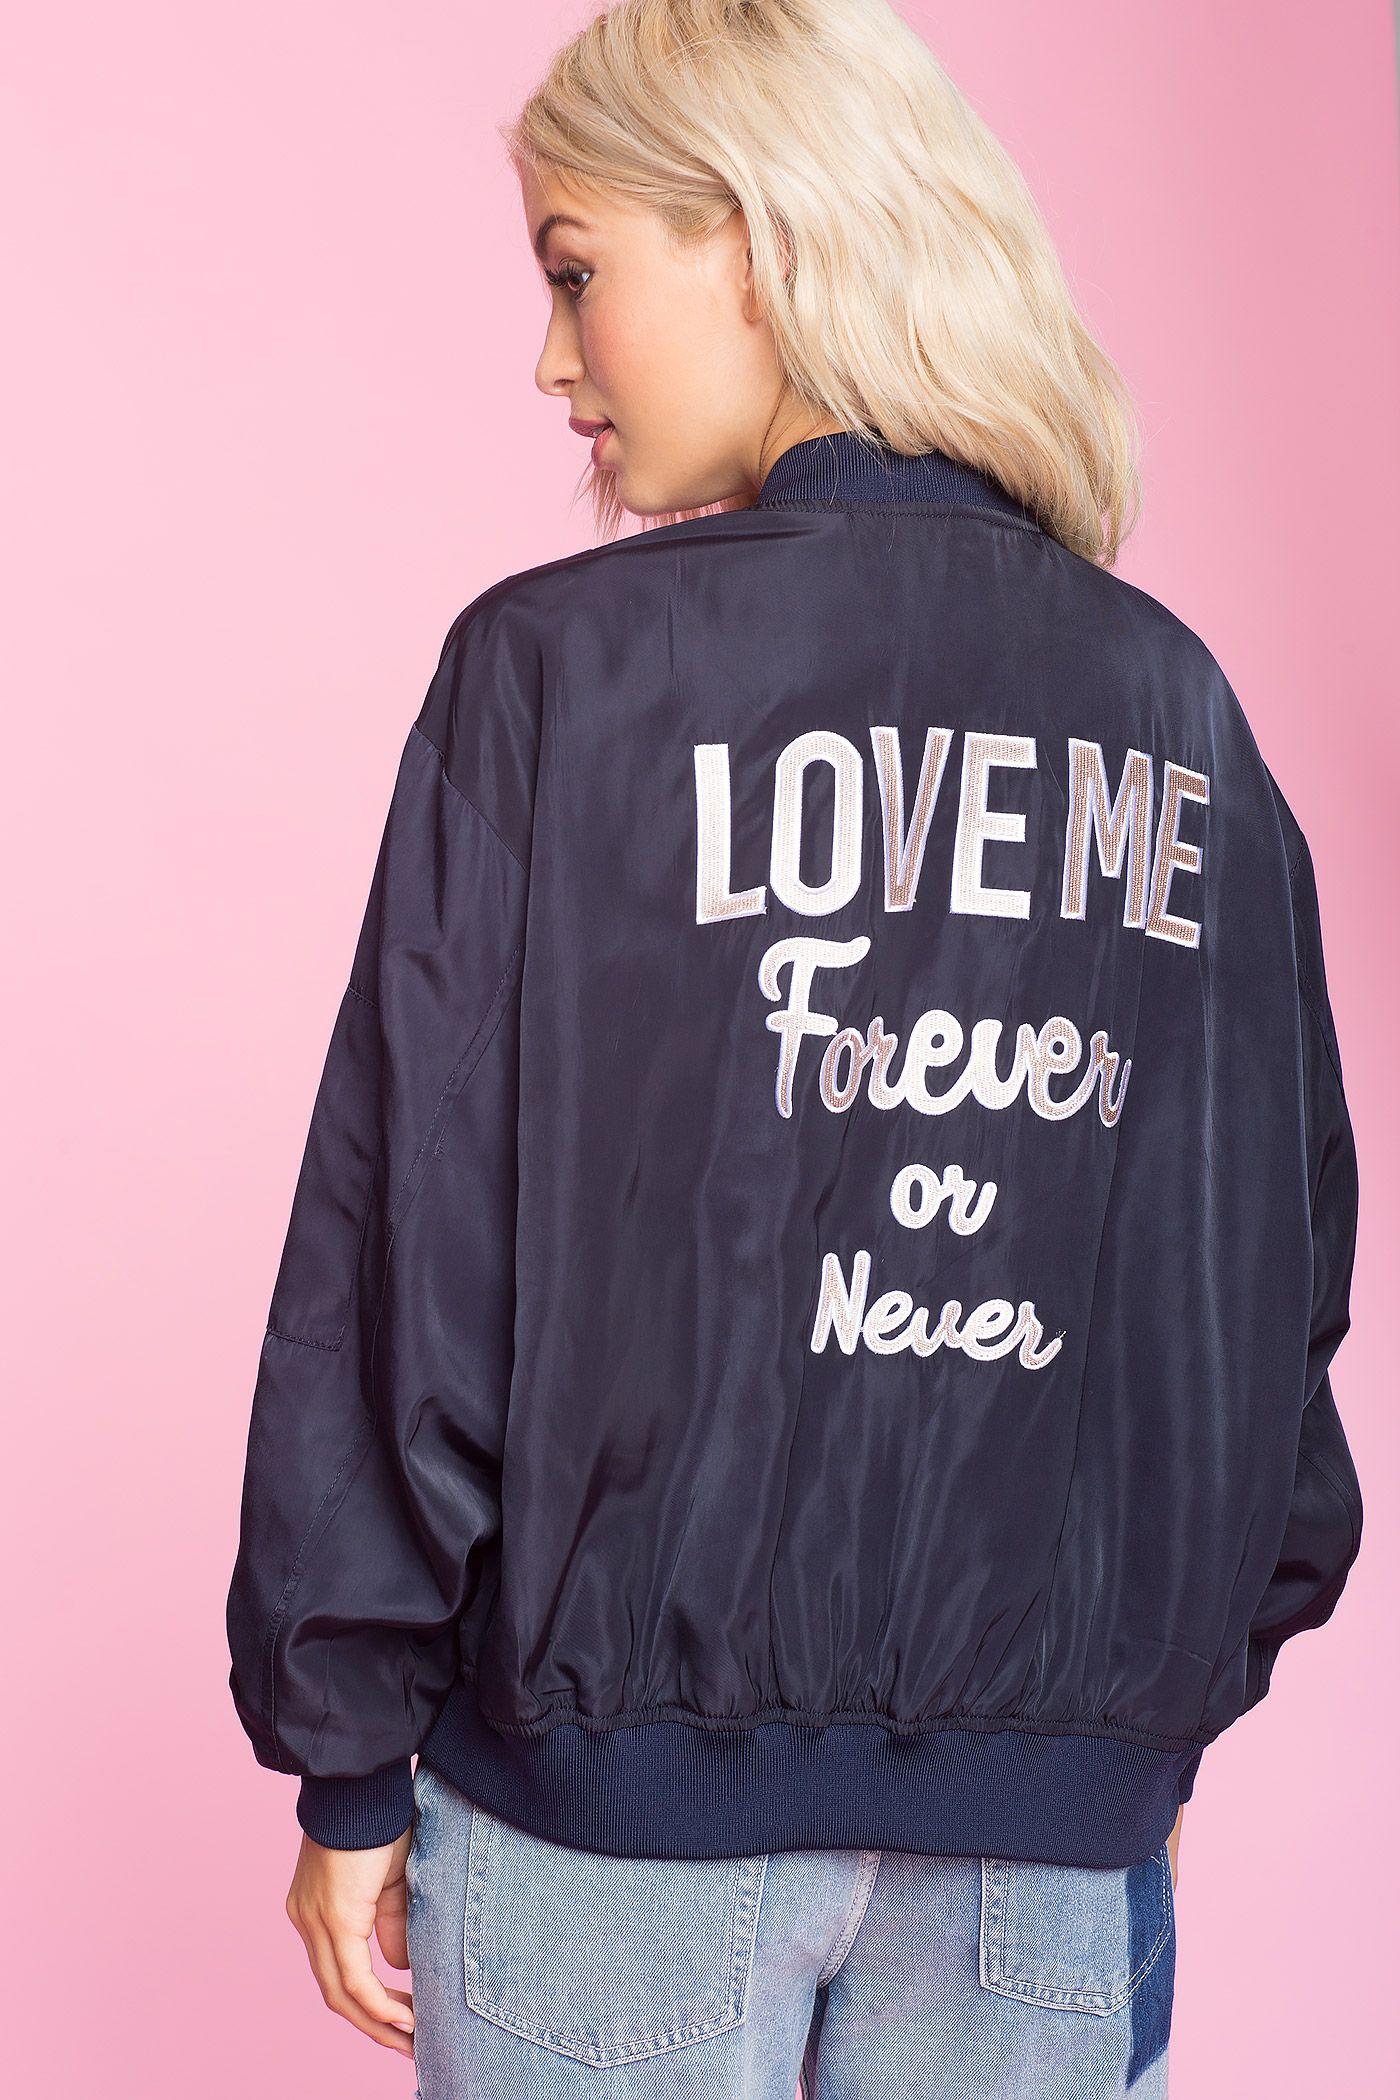 Women S Jackets Love Me Text Bomber Jacket Bomber Jacket Jackets Coats Jackets Women [ 2100 x 1400 Pixel ]